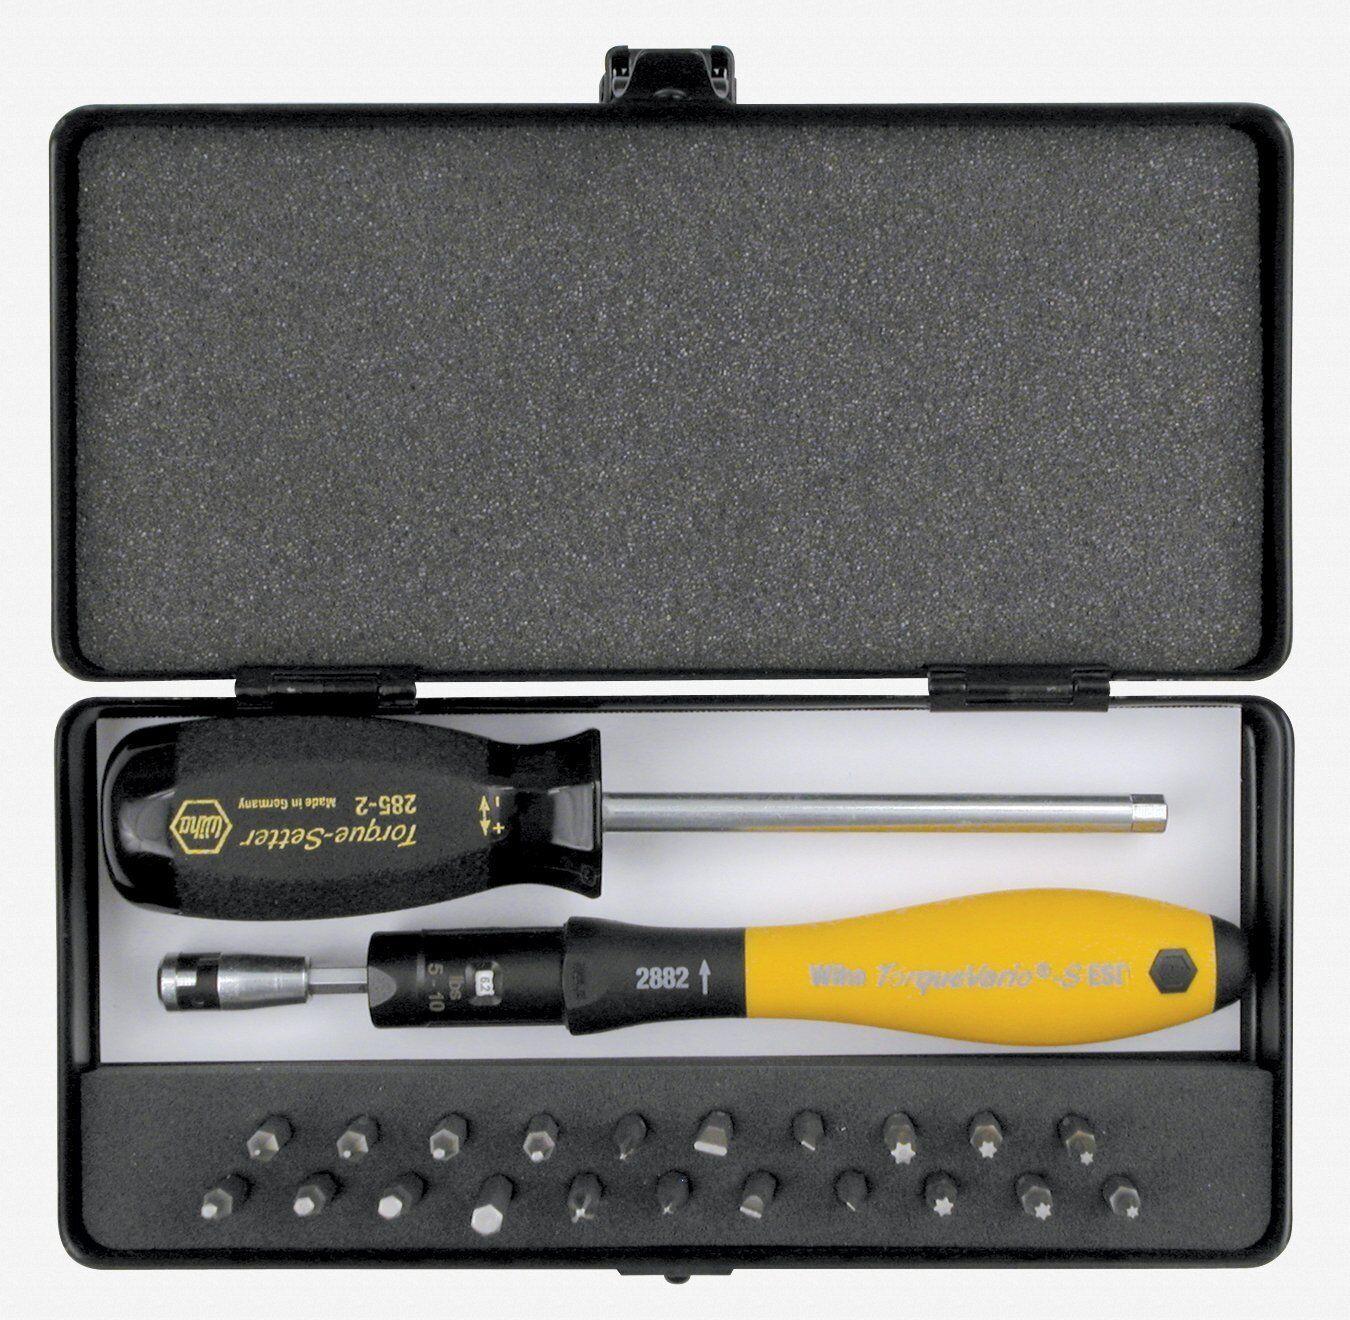 Wiha 28895 24 Piece ESD Torque ScrewDriver, Micro Bits and Handle Box Set